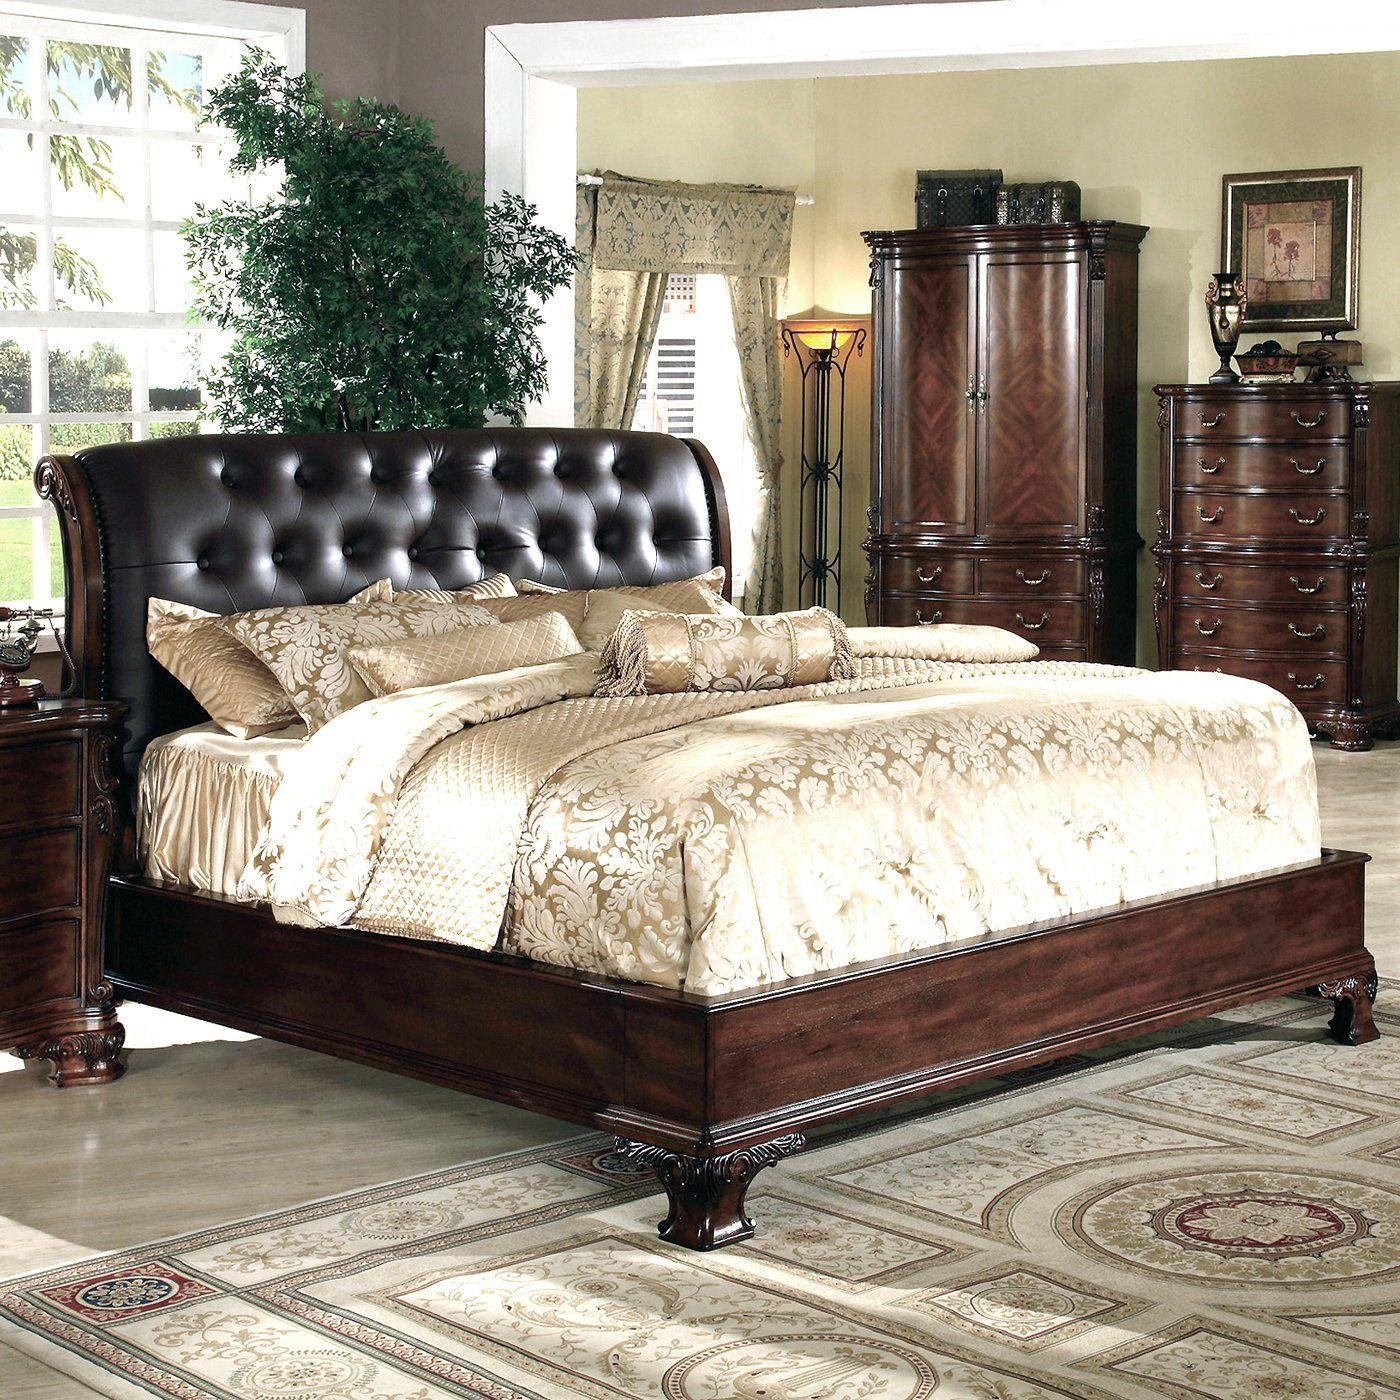 Yuan Tai Furniture Da590 Dasan Bed With Images King Bedroom